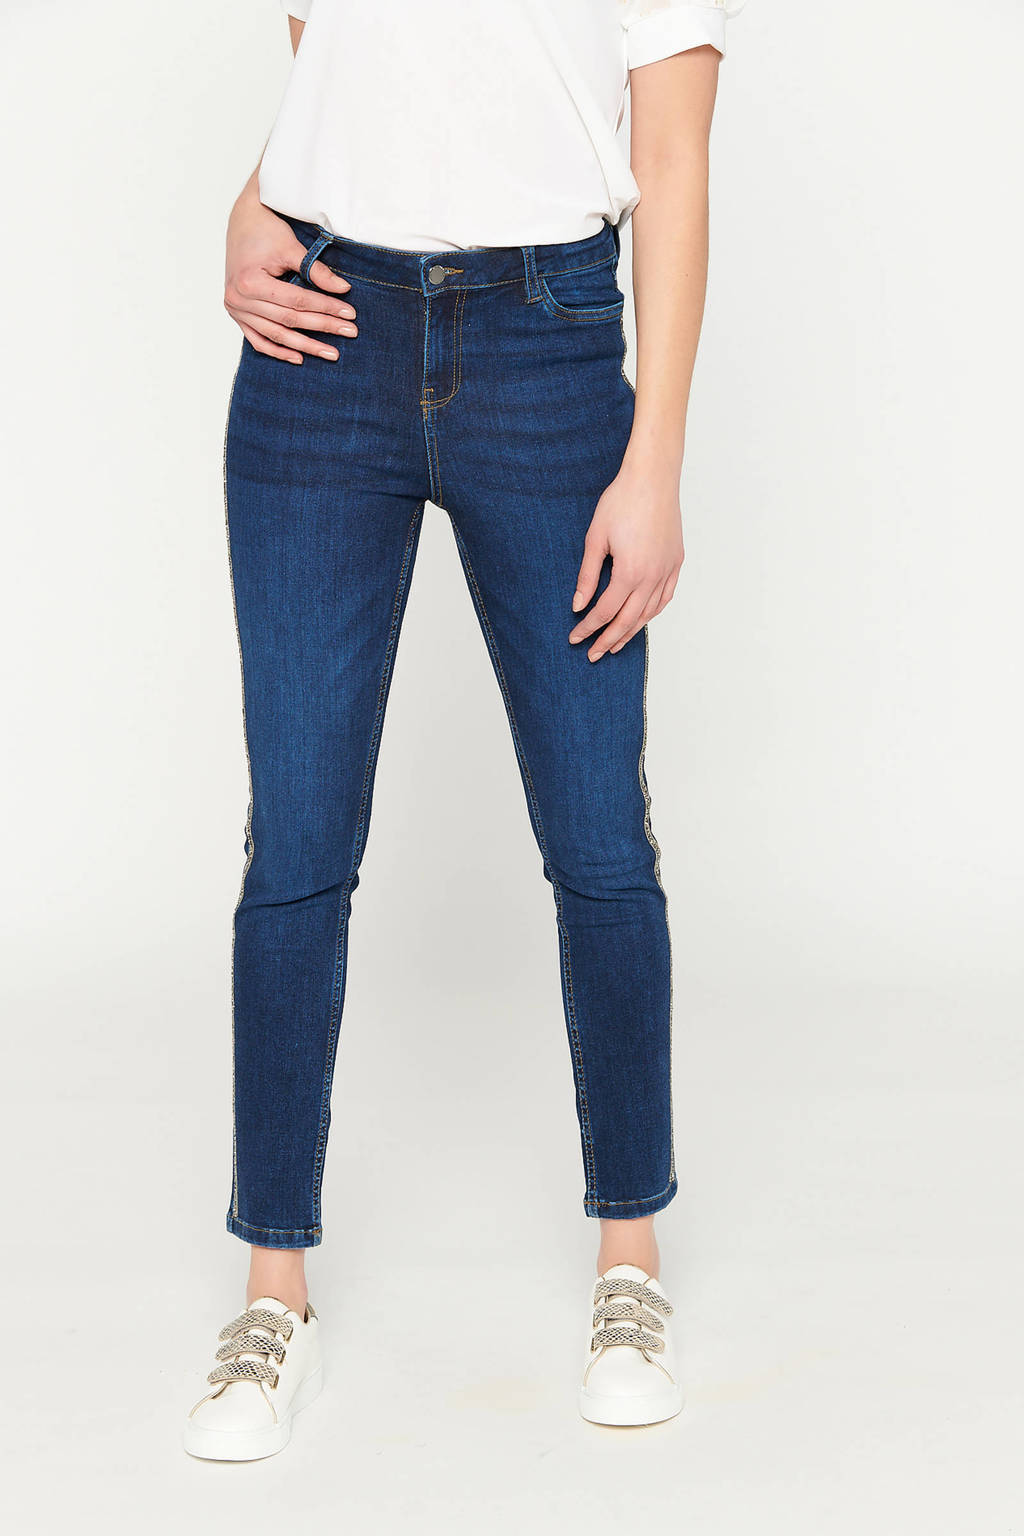 LOLALIZA skinny jeans donkerblauw, Donkerblauw